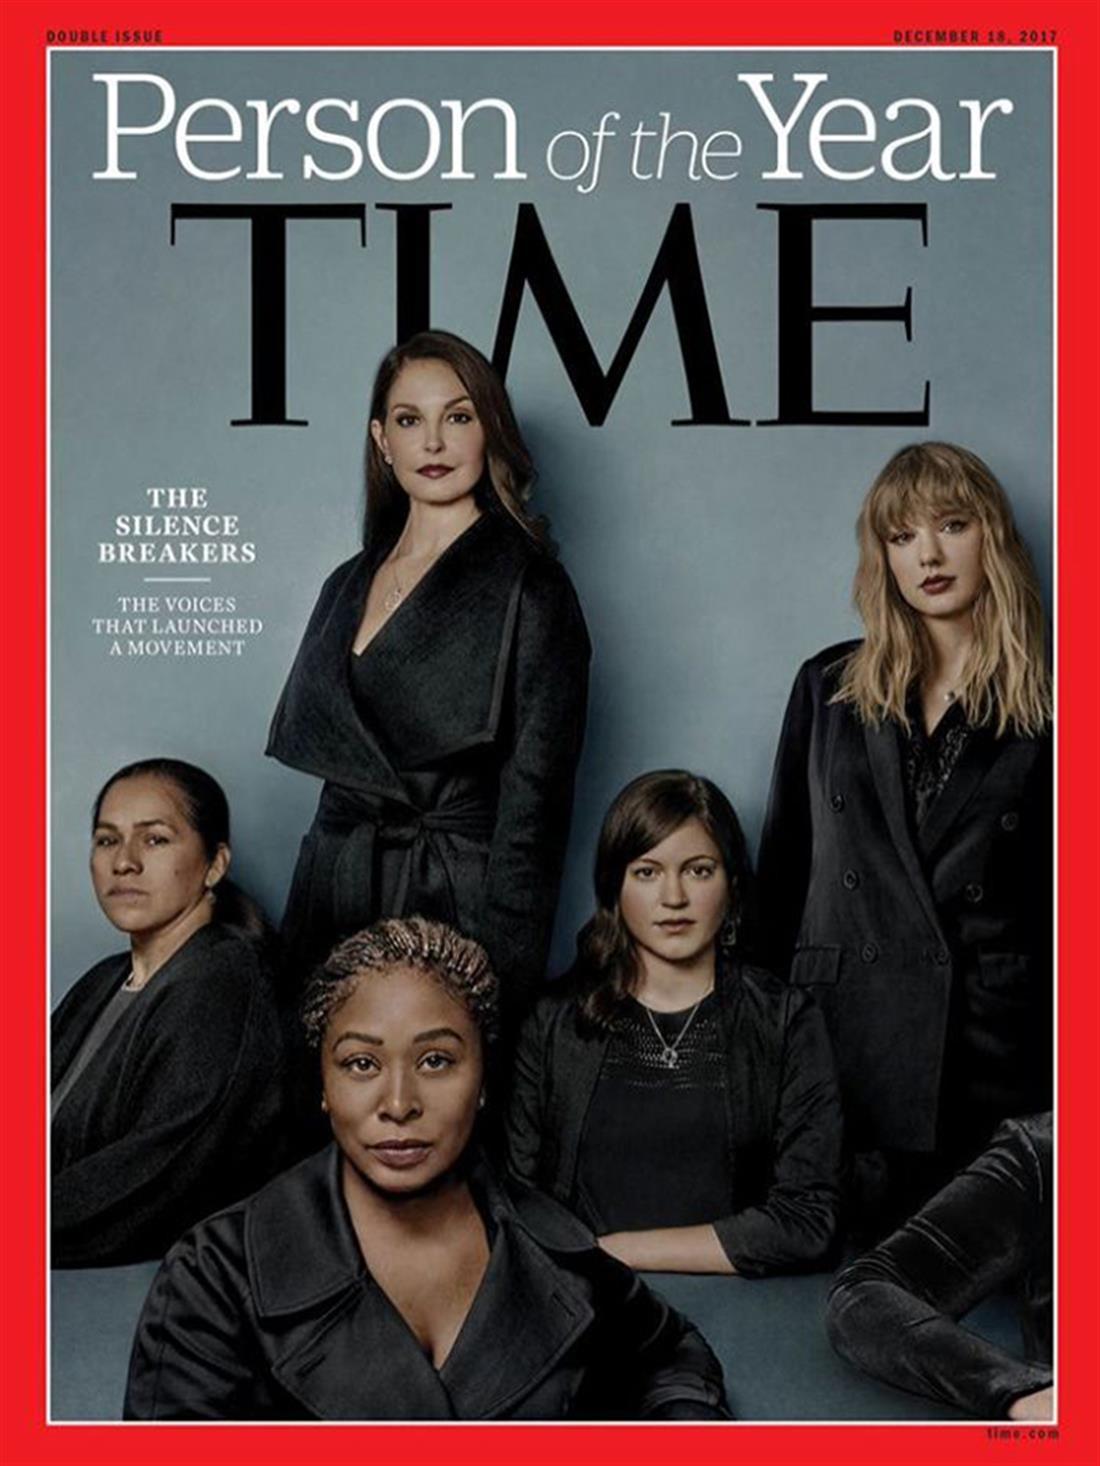 Time - Πρόσωπο της χρονιάς - σεξουαλική κακοποίηση - #MeToo